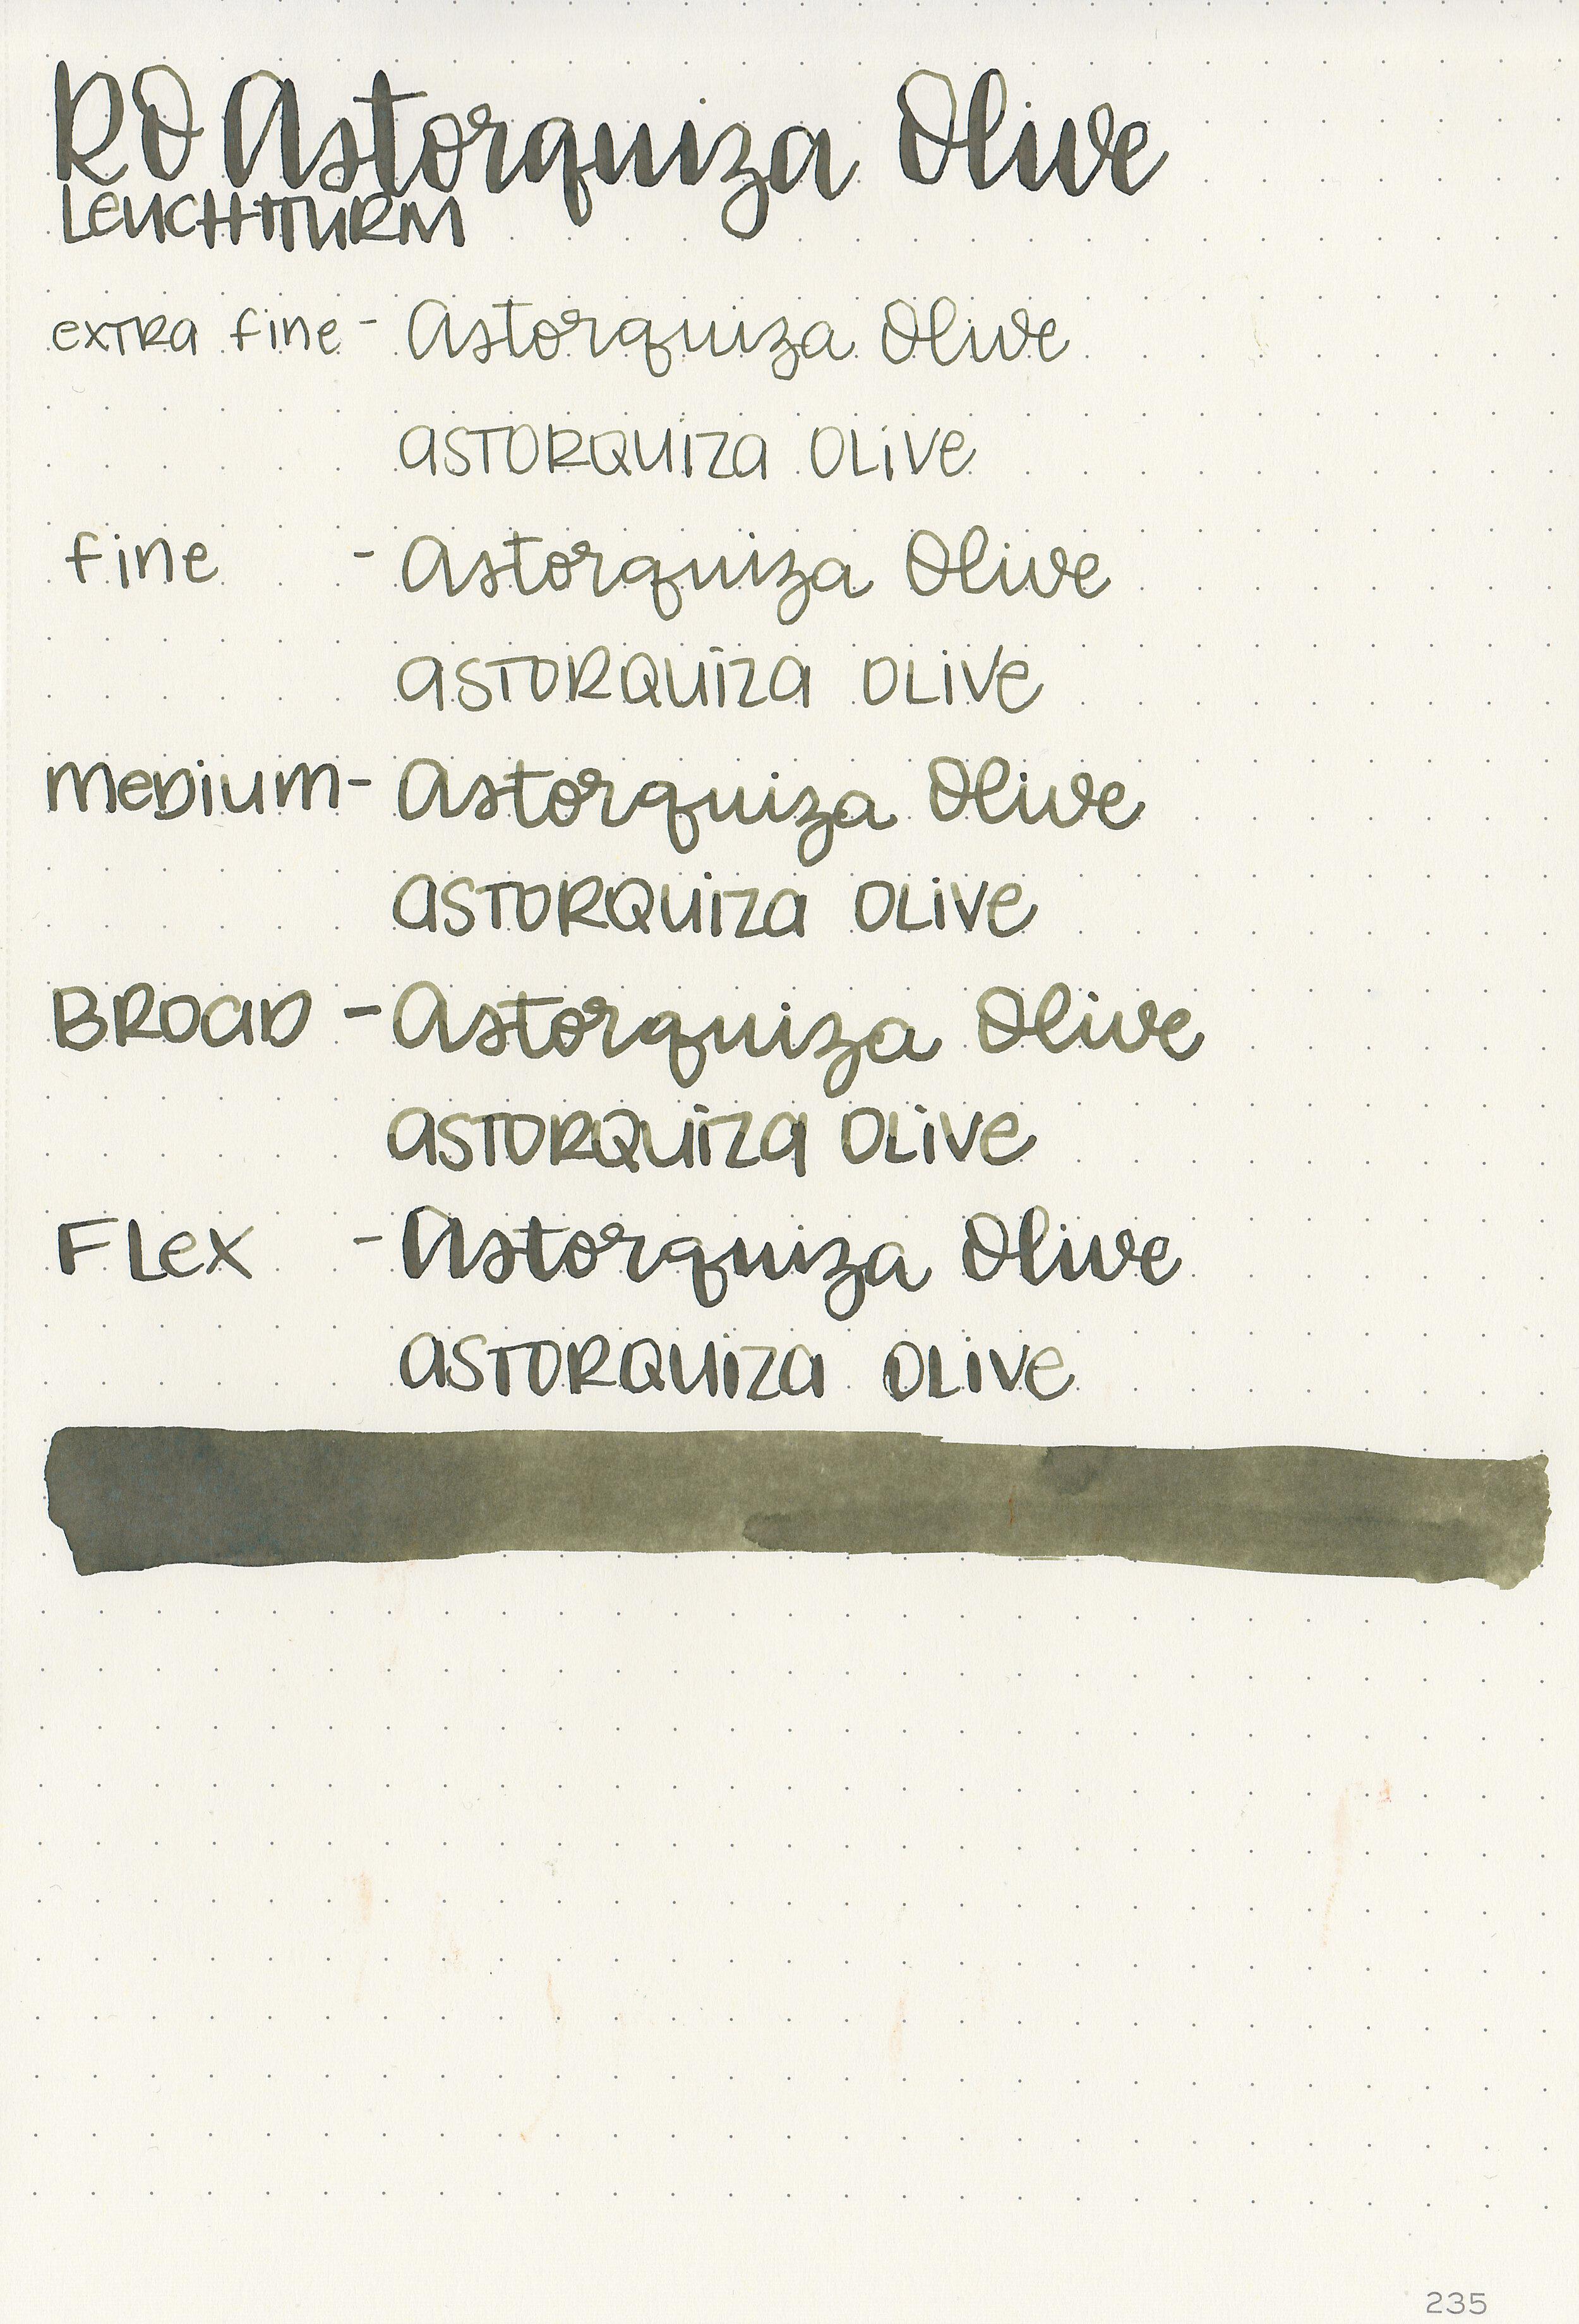 ro-astorquiza-olive-9.jpg